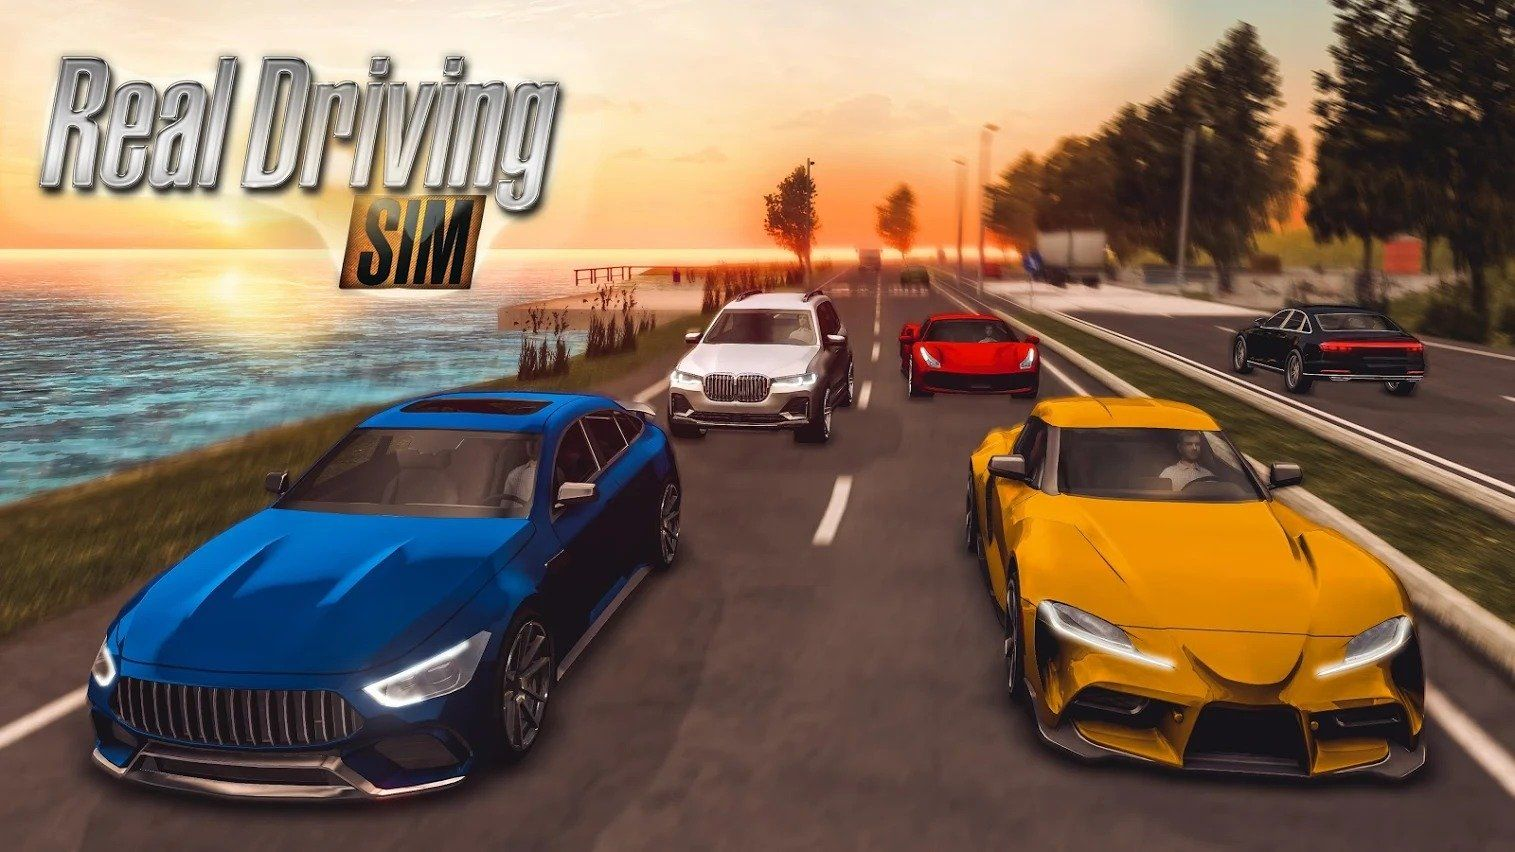 a7b879e0f71c8386ed7c52a0ddbe0d3d - How To Get Money Fast In Vehicle Simulator 2018